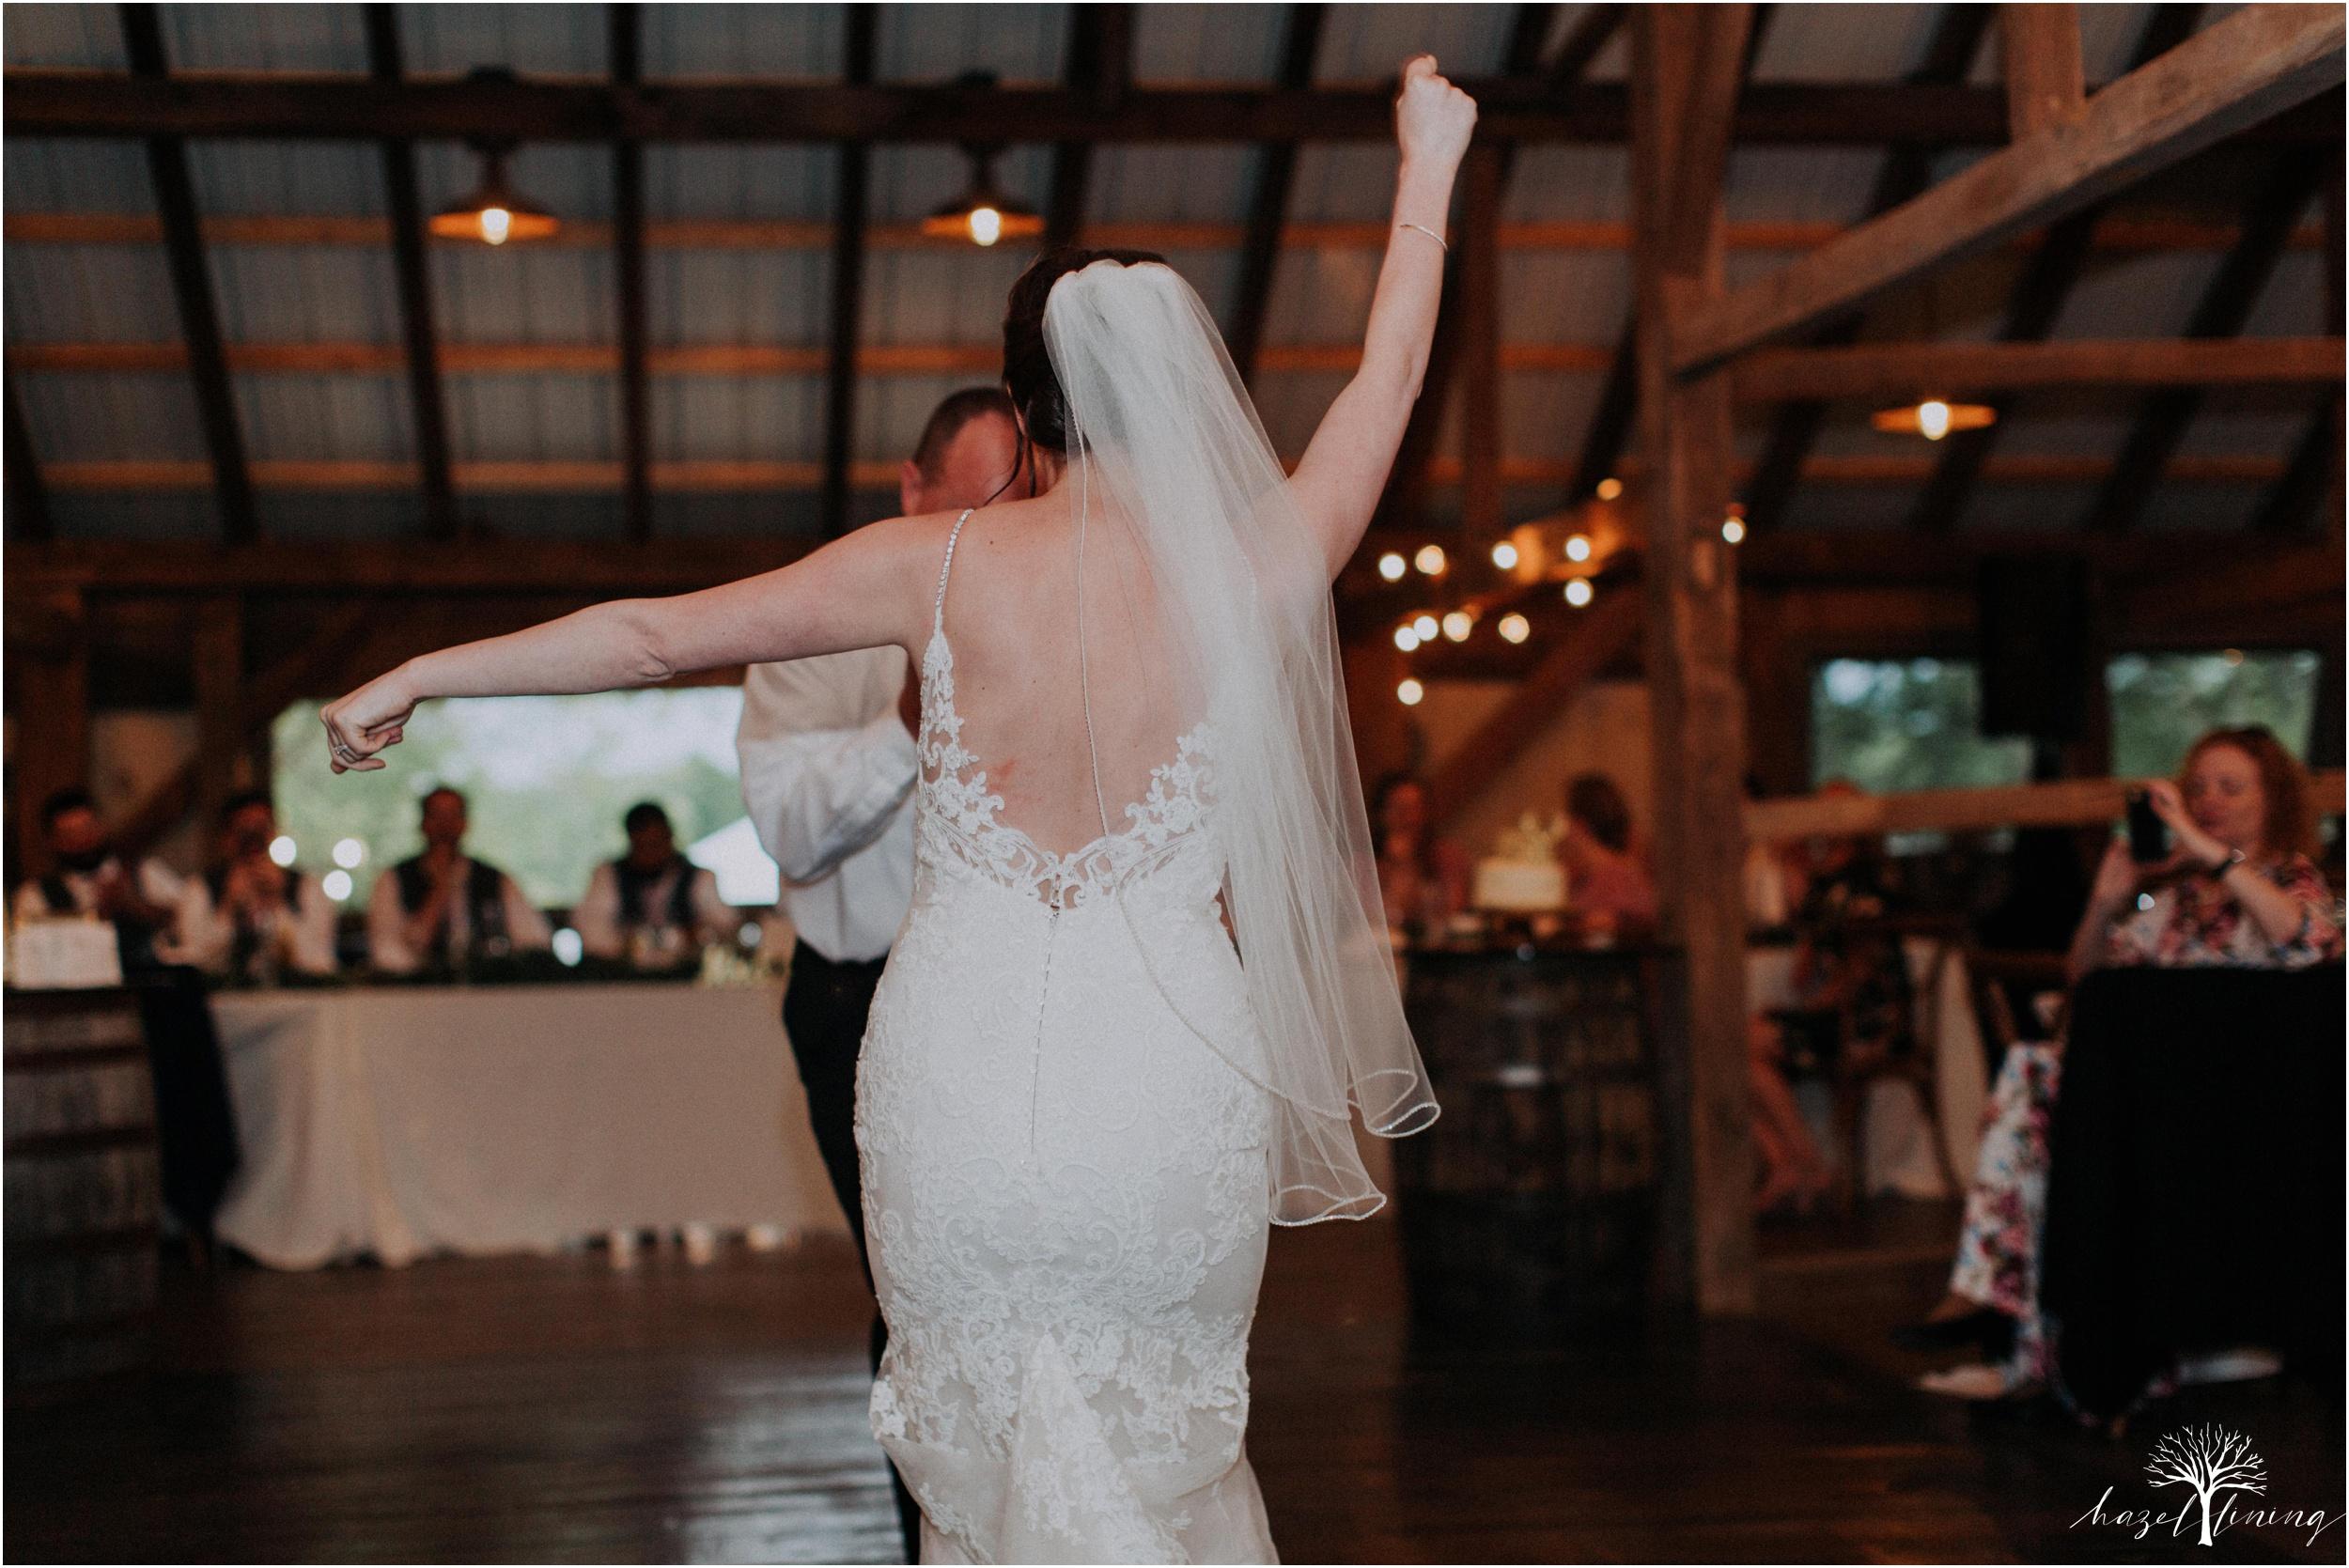 hazel-lining-travel-wedding-elopement-photography-lisa-landon-shoemaker-the-farm-bakery-and-events-bucks-county-quakertown-pennsylvania-summer-country-outdoor-farm-wedding_0130.jpg